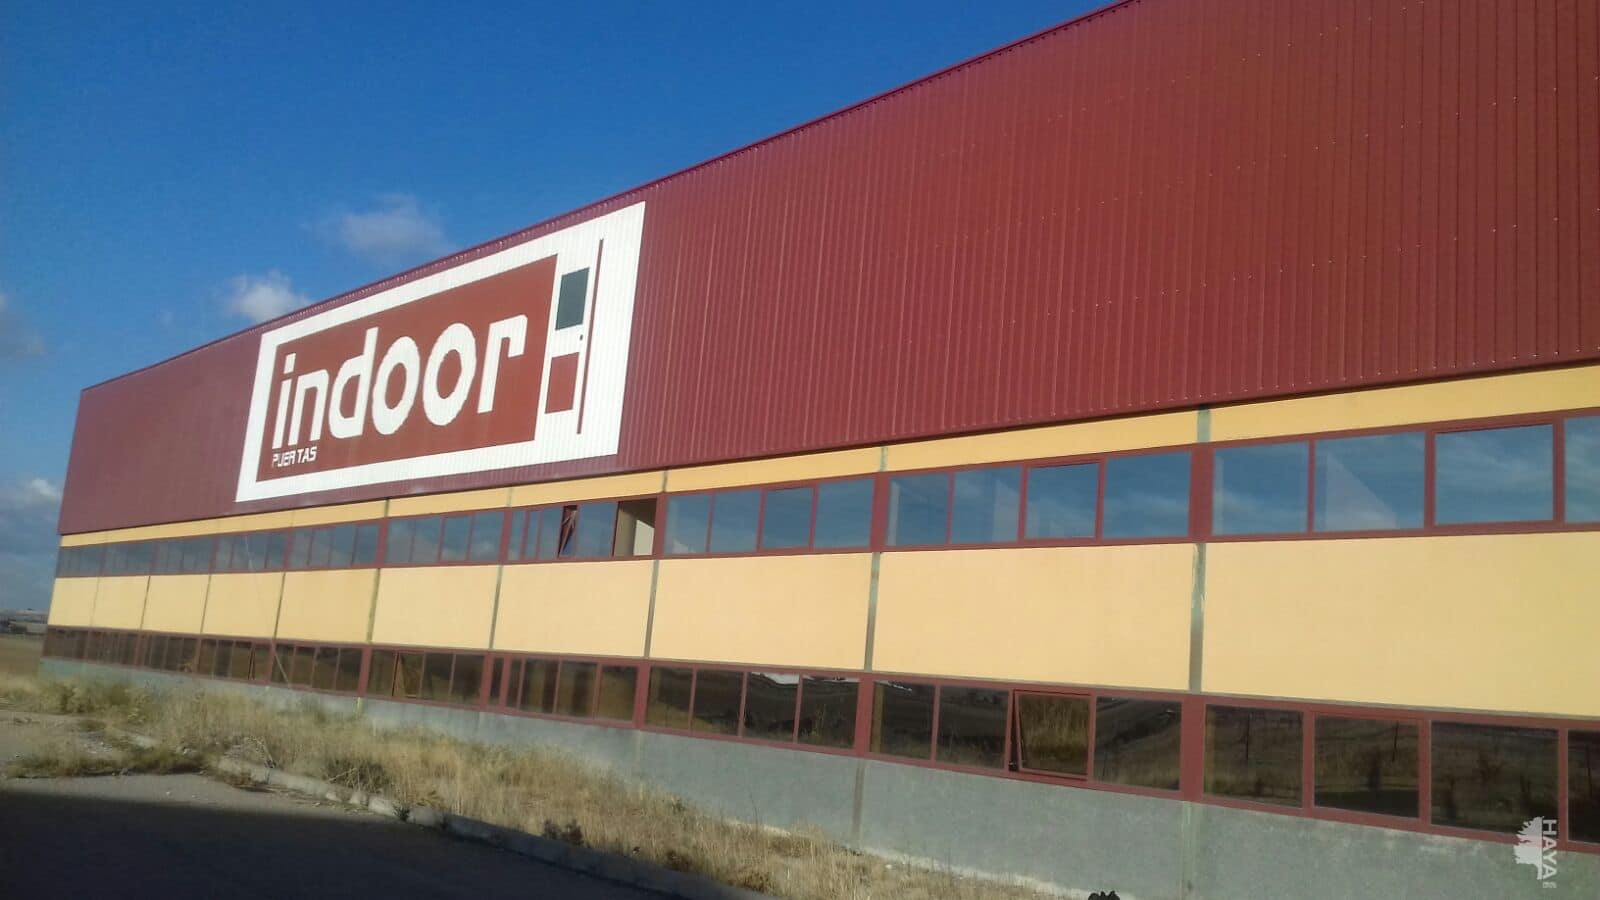 Industrial en venta en Montalbo, Montalbo, Cuenca, Calle Calle Congosto, 613.217 €, 3496 m2